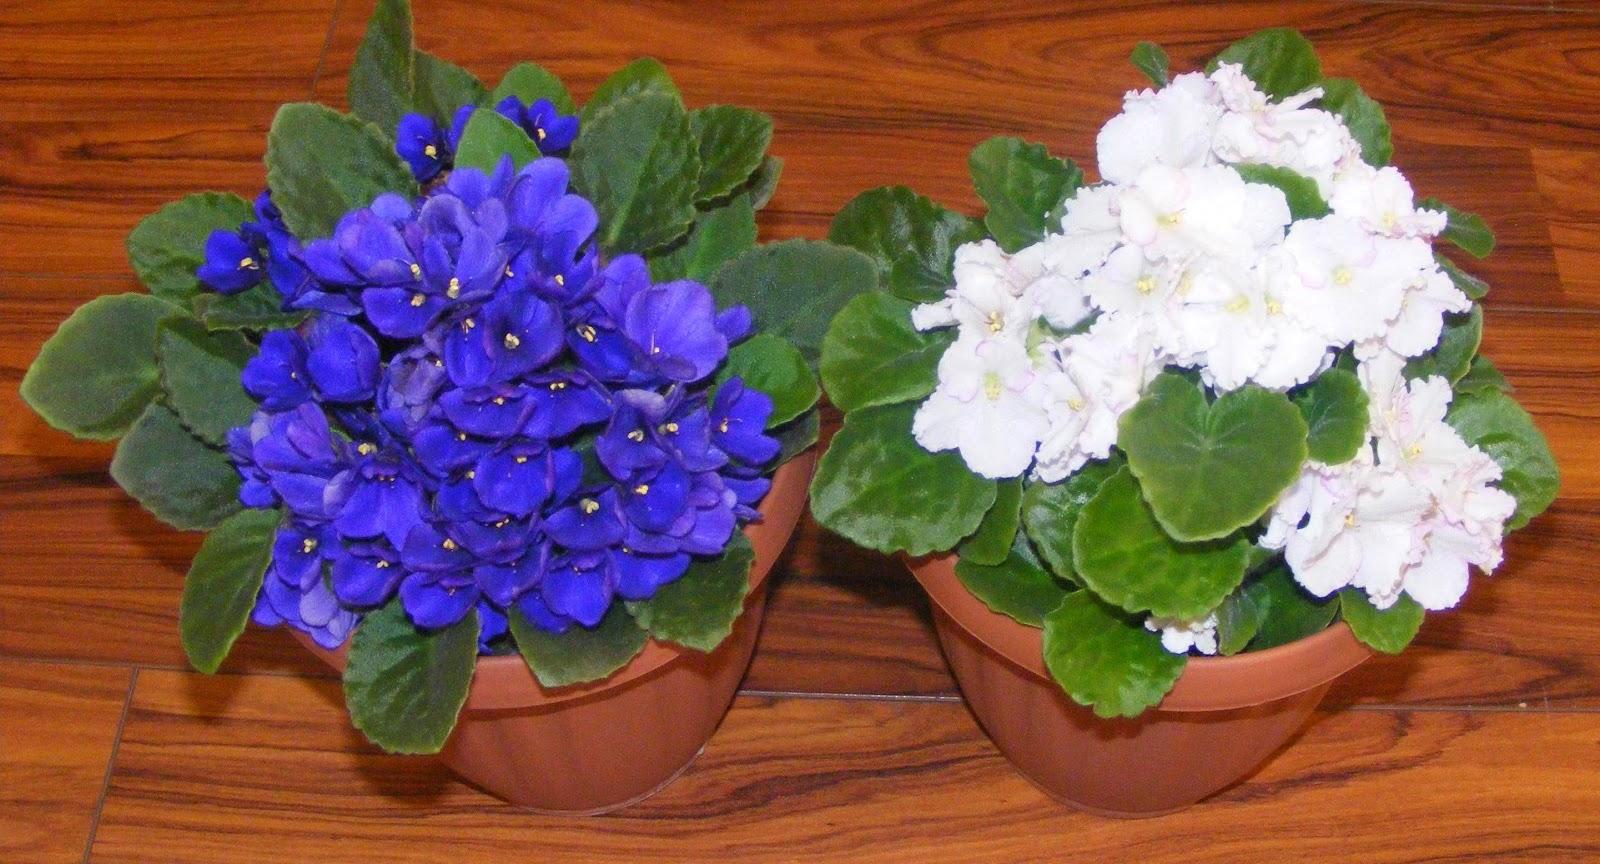 Violete de parma flori decorative de apartament,